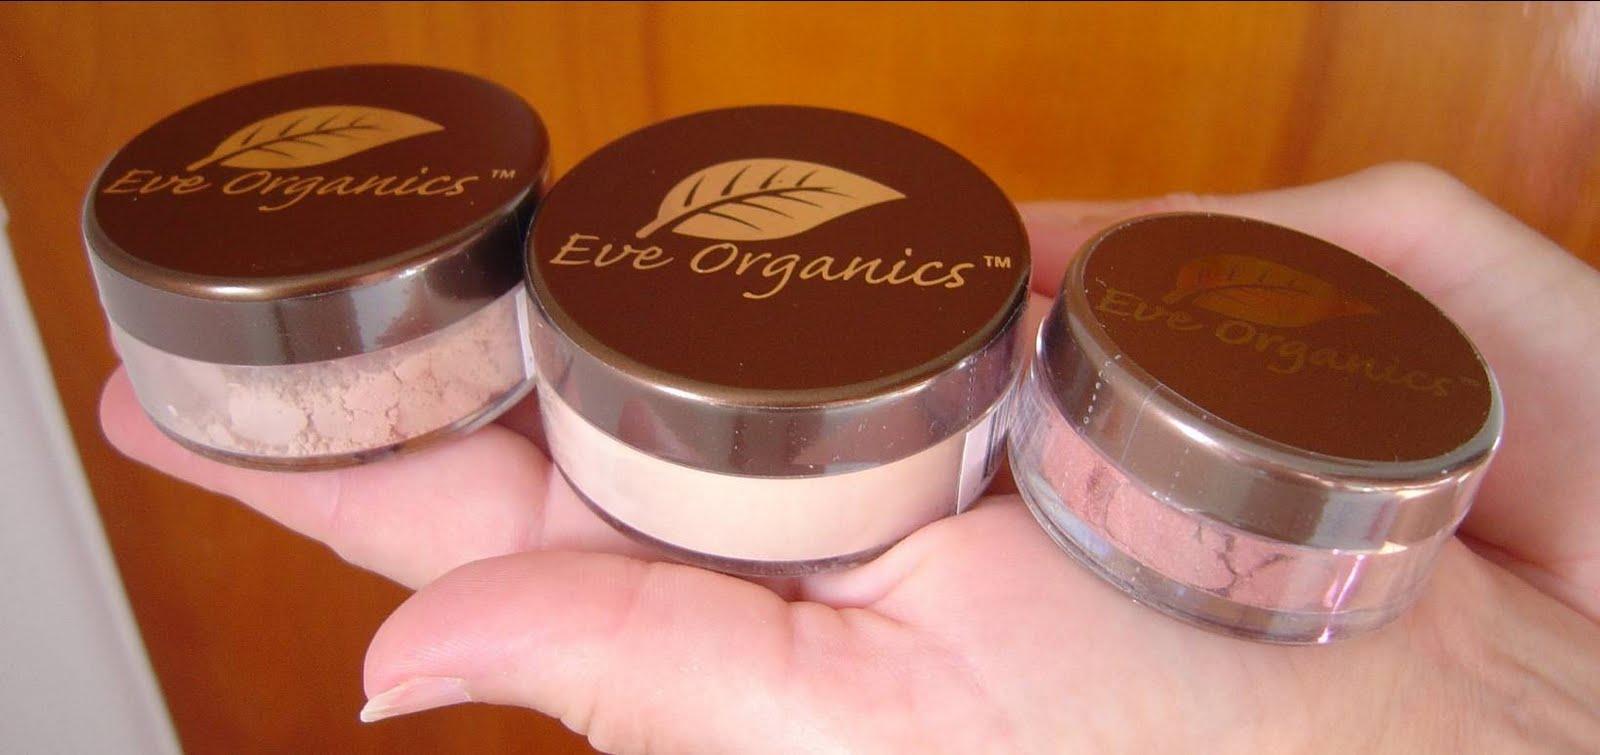 Eve Organics mineral foundation, setting powder and blush.jpeg